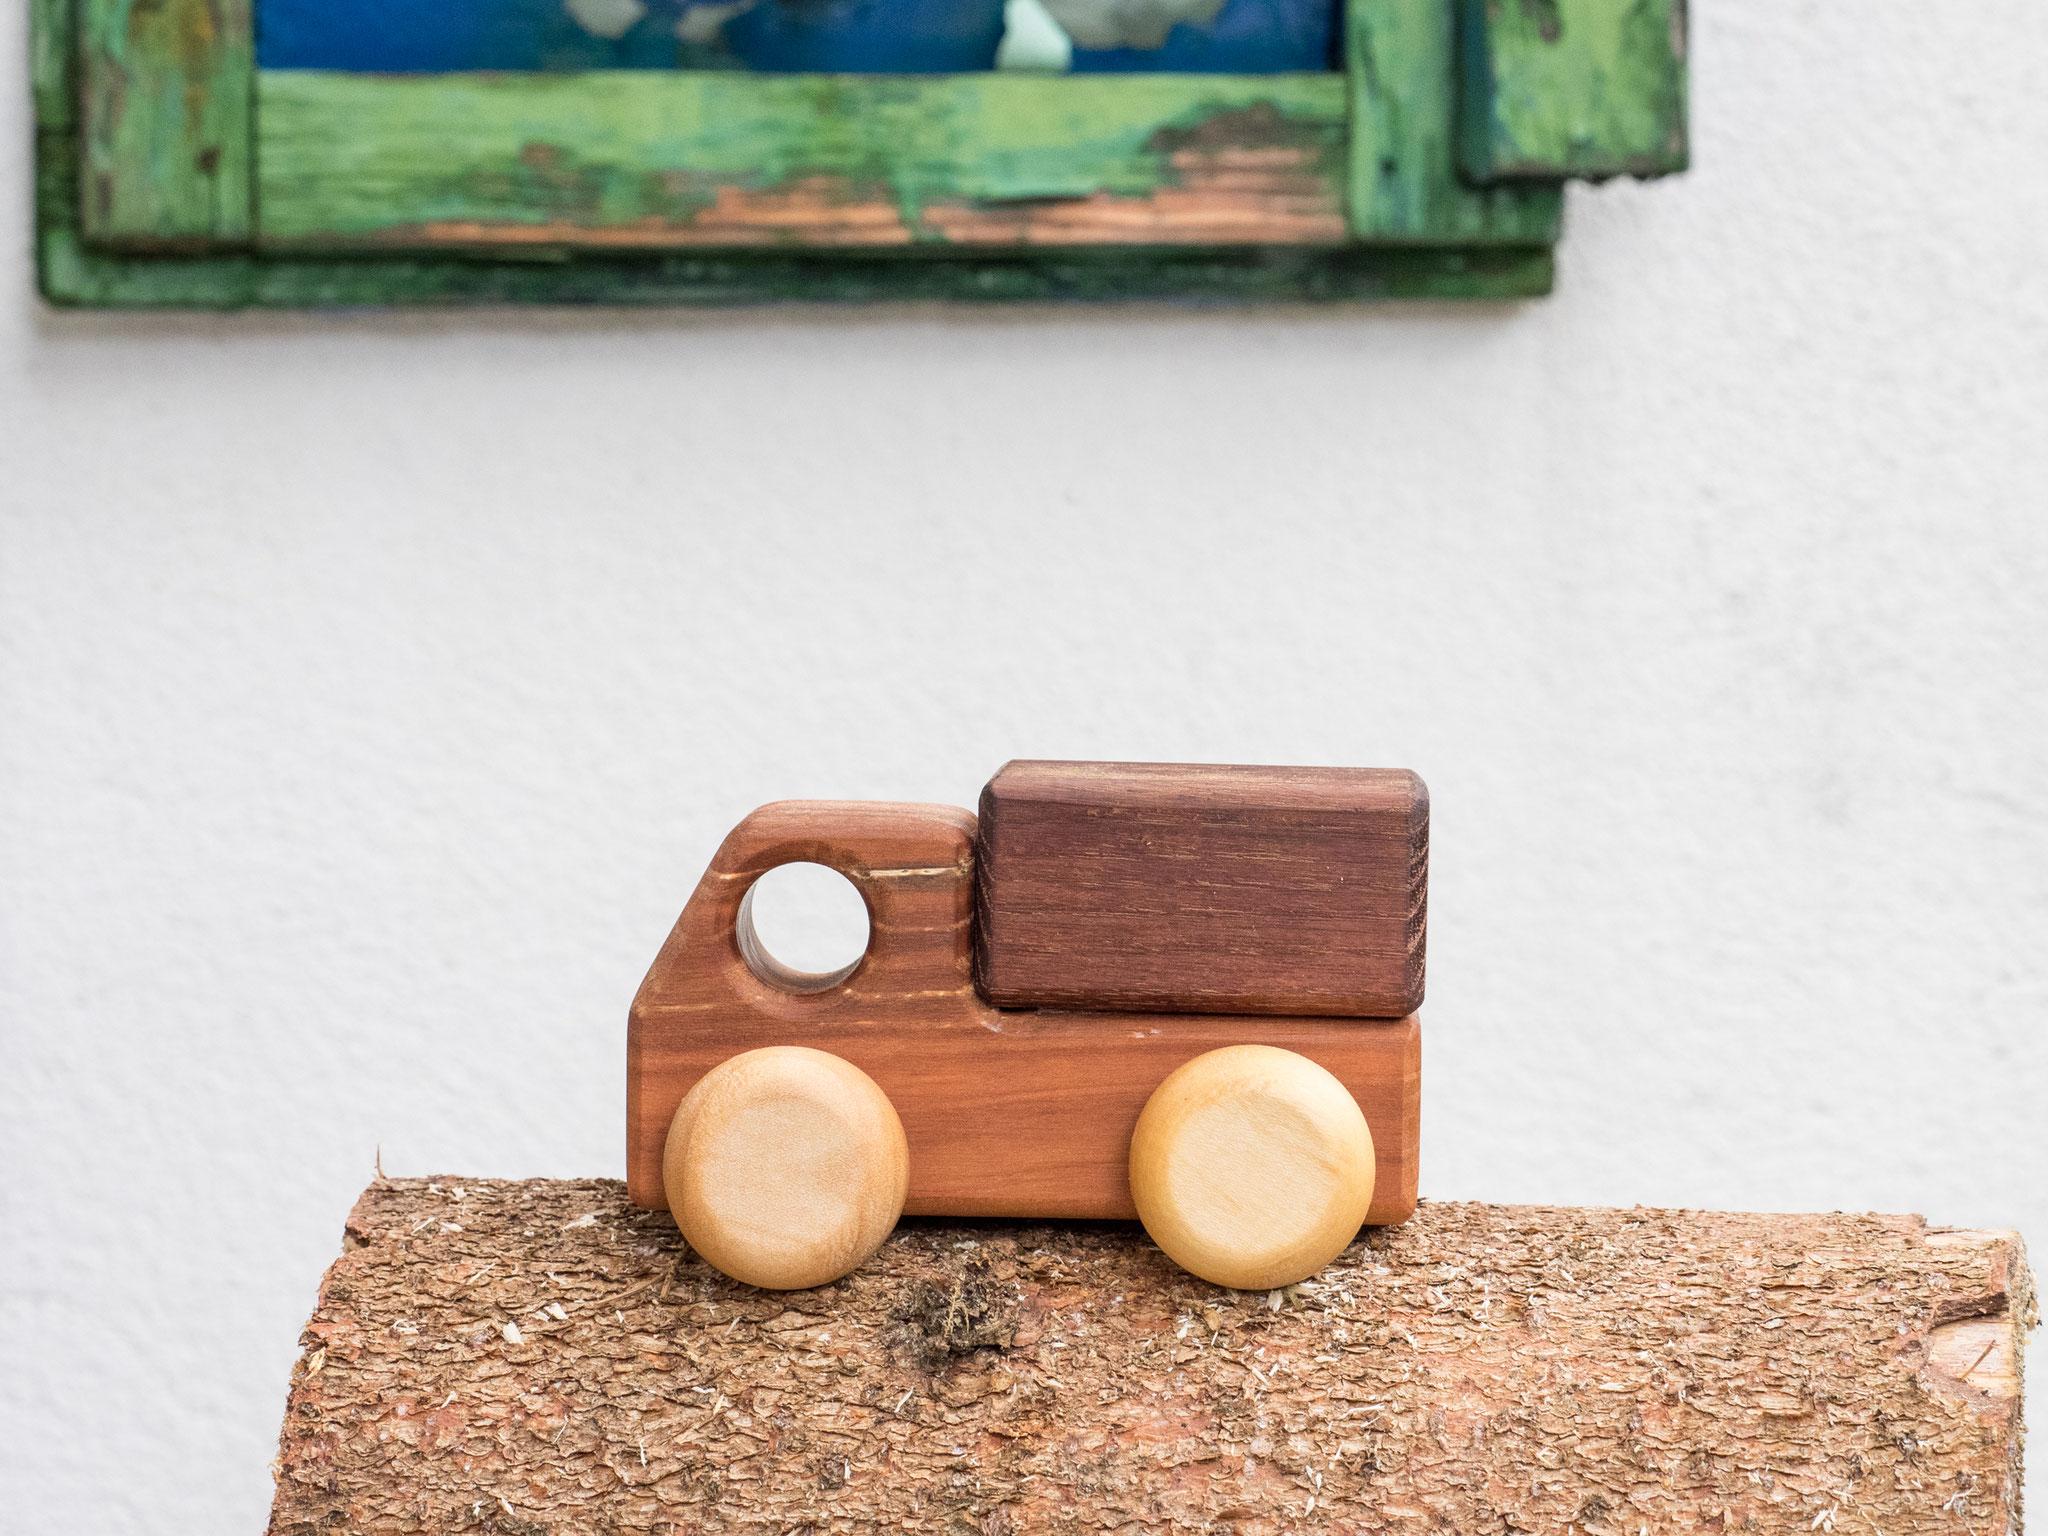 Spielzeuglaster aus Holz